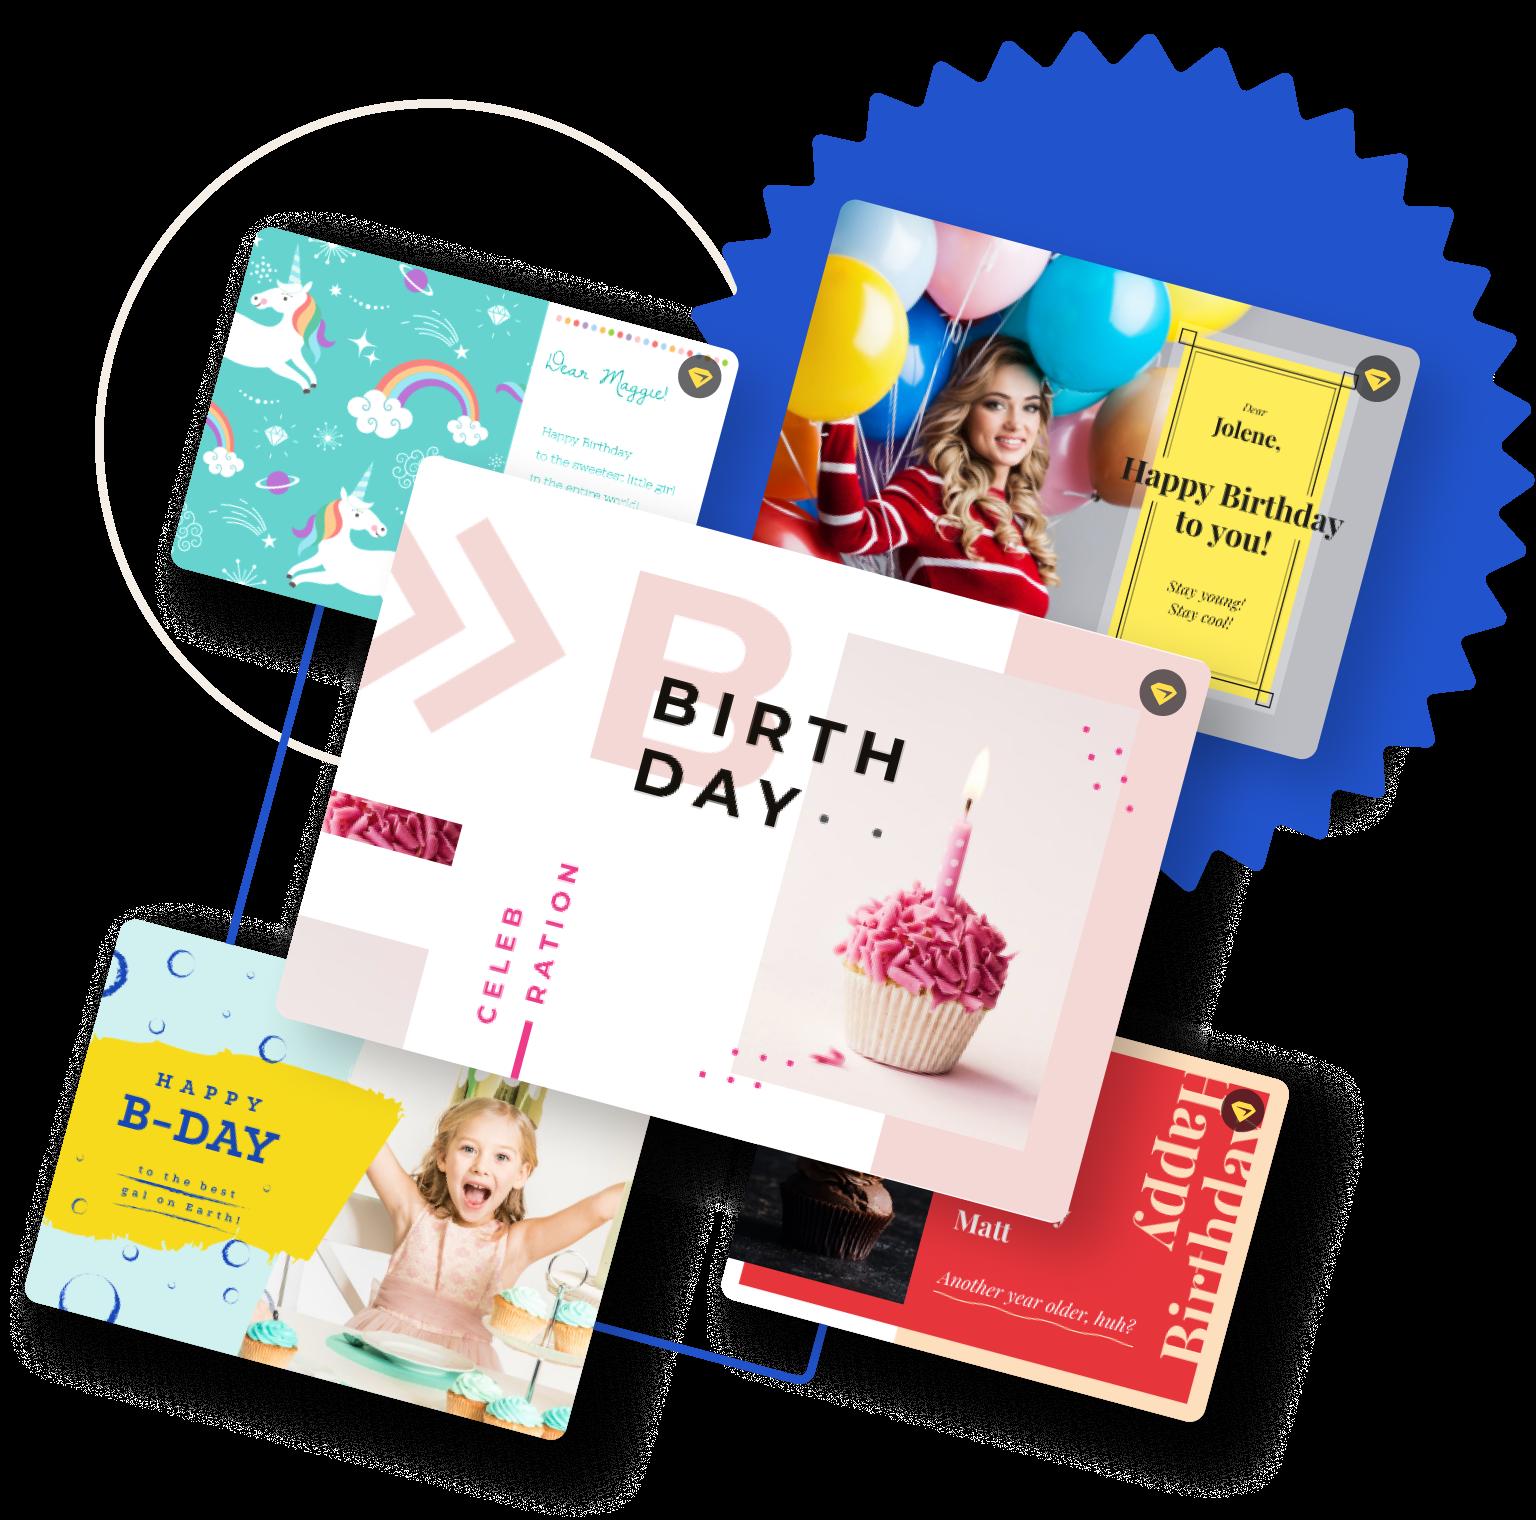 Birthday Card Maker Create Custom Bday Cards Online Free Crello